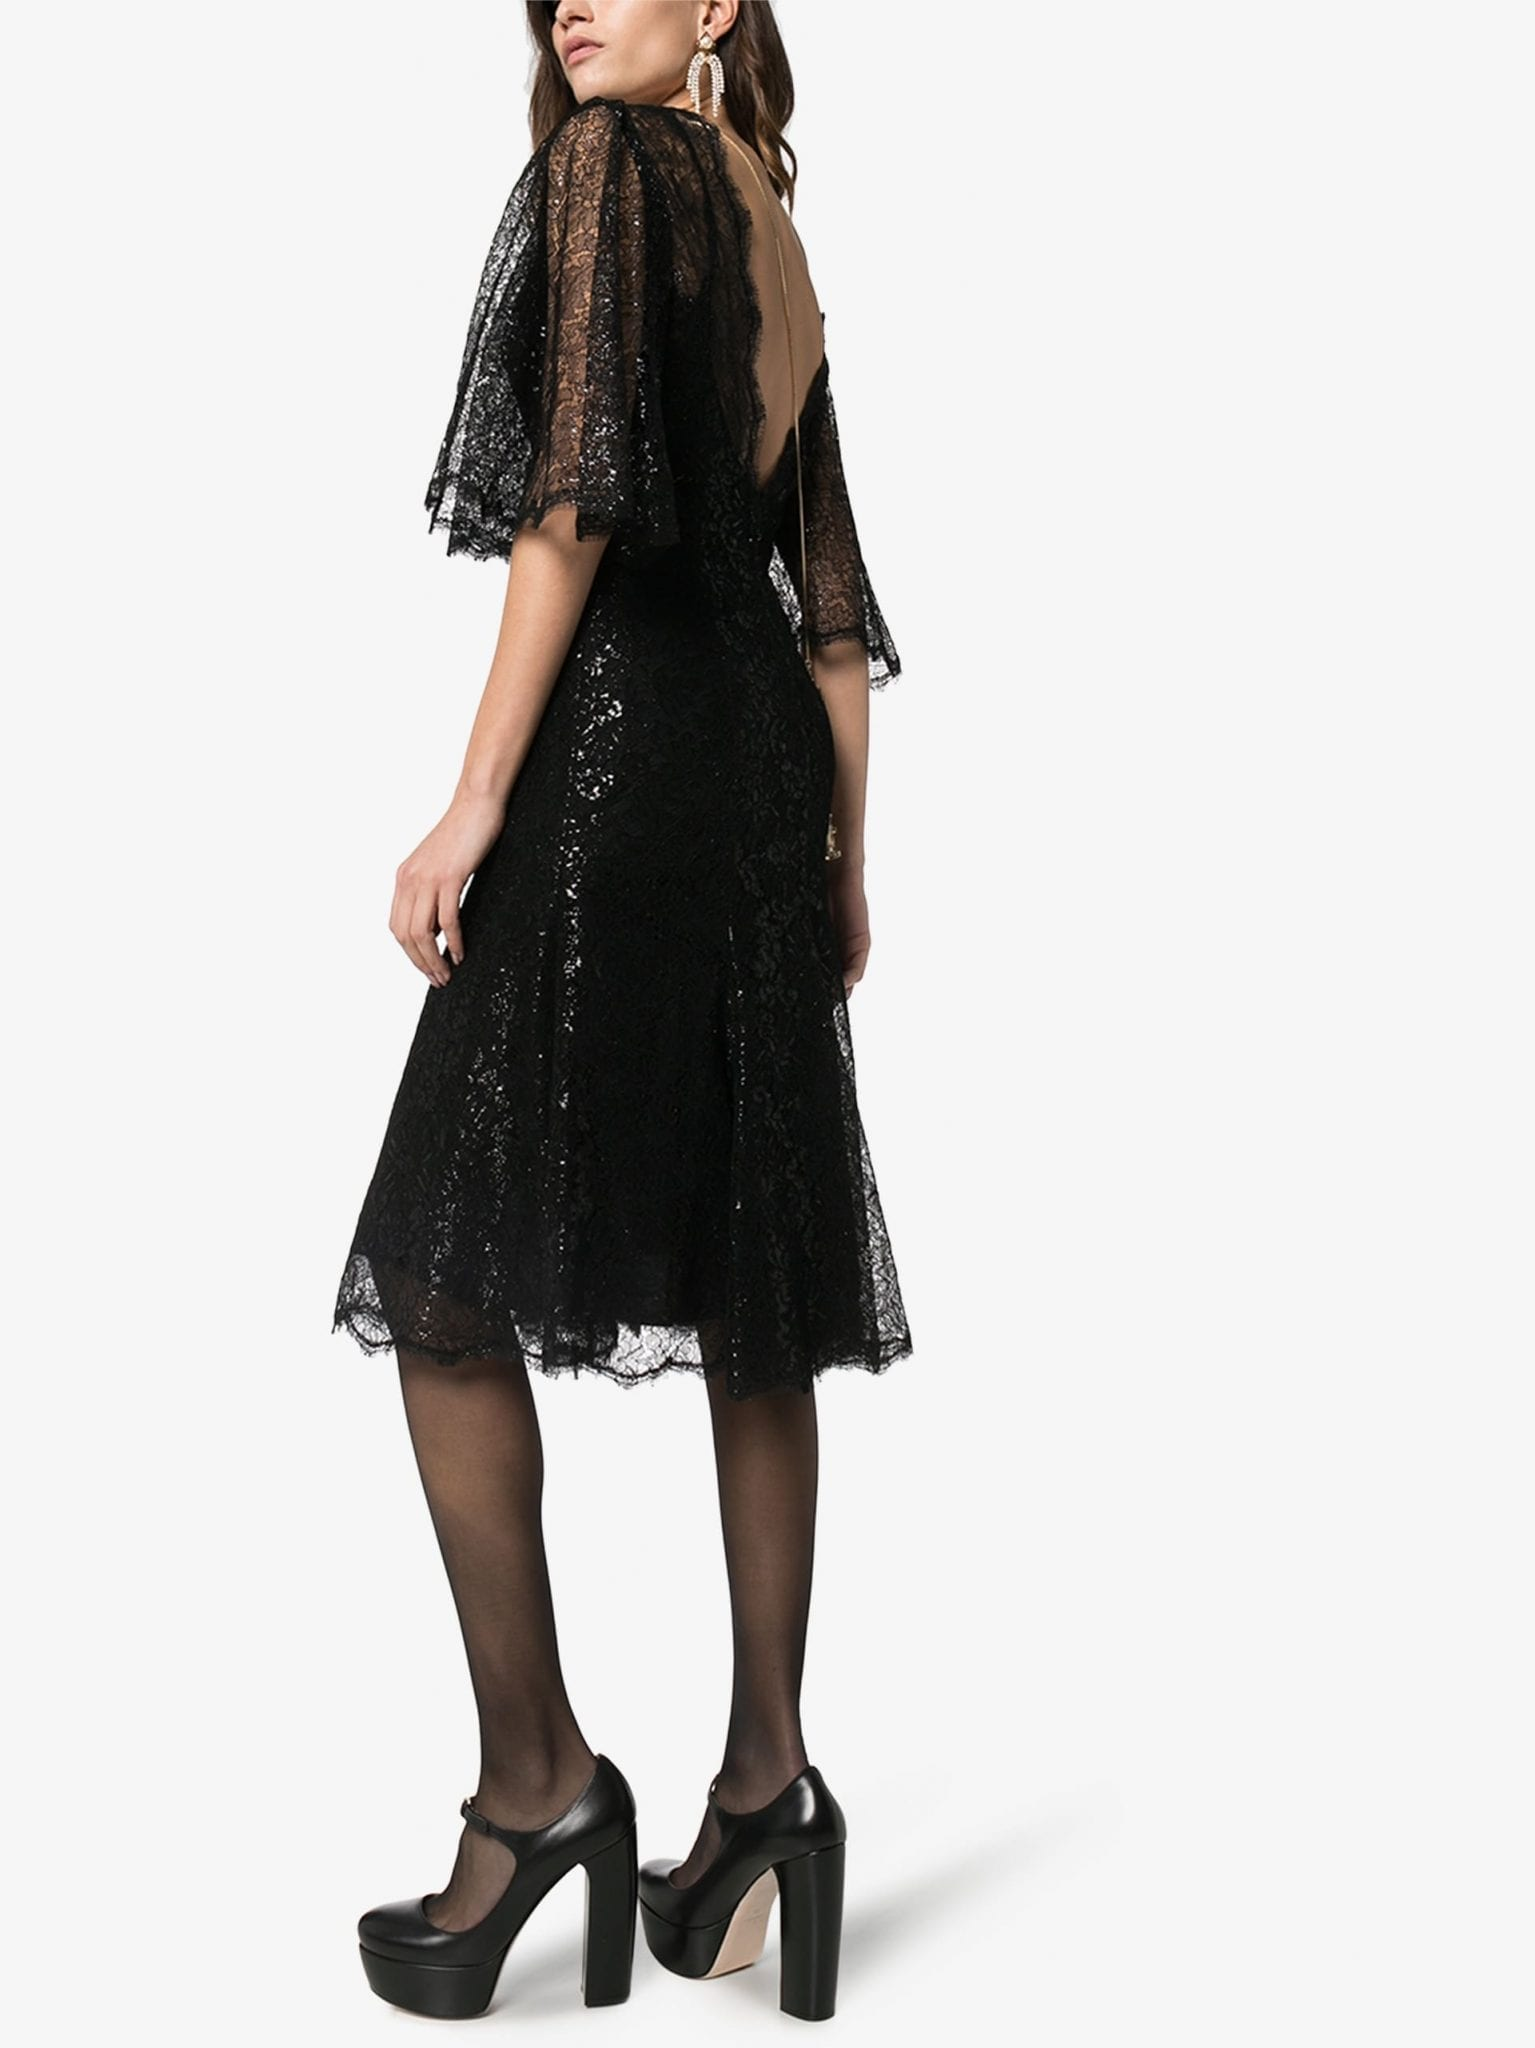 DOLCE & GABBANA Low Back Lace Flared Dress